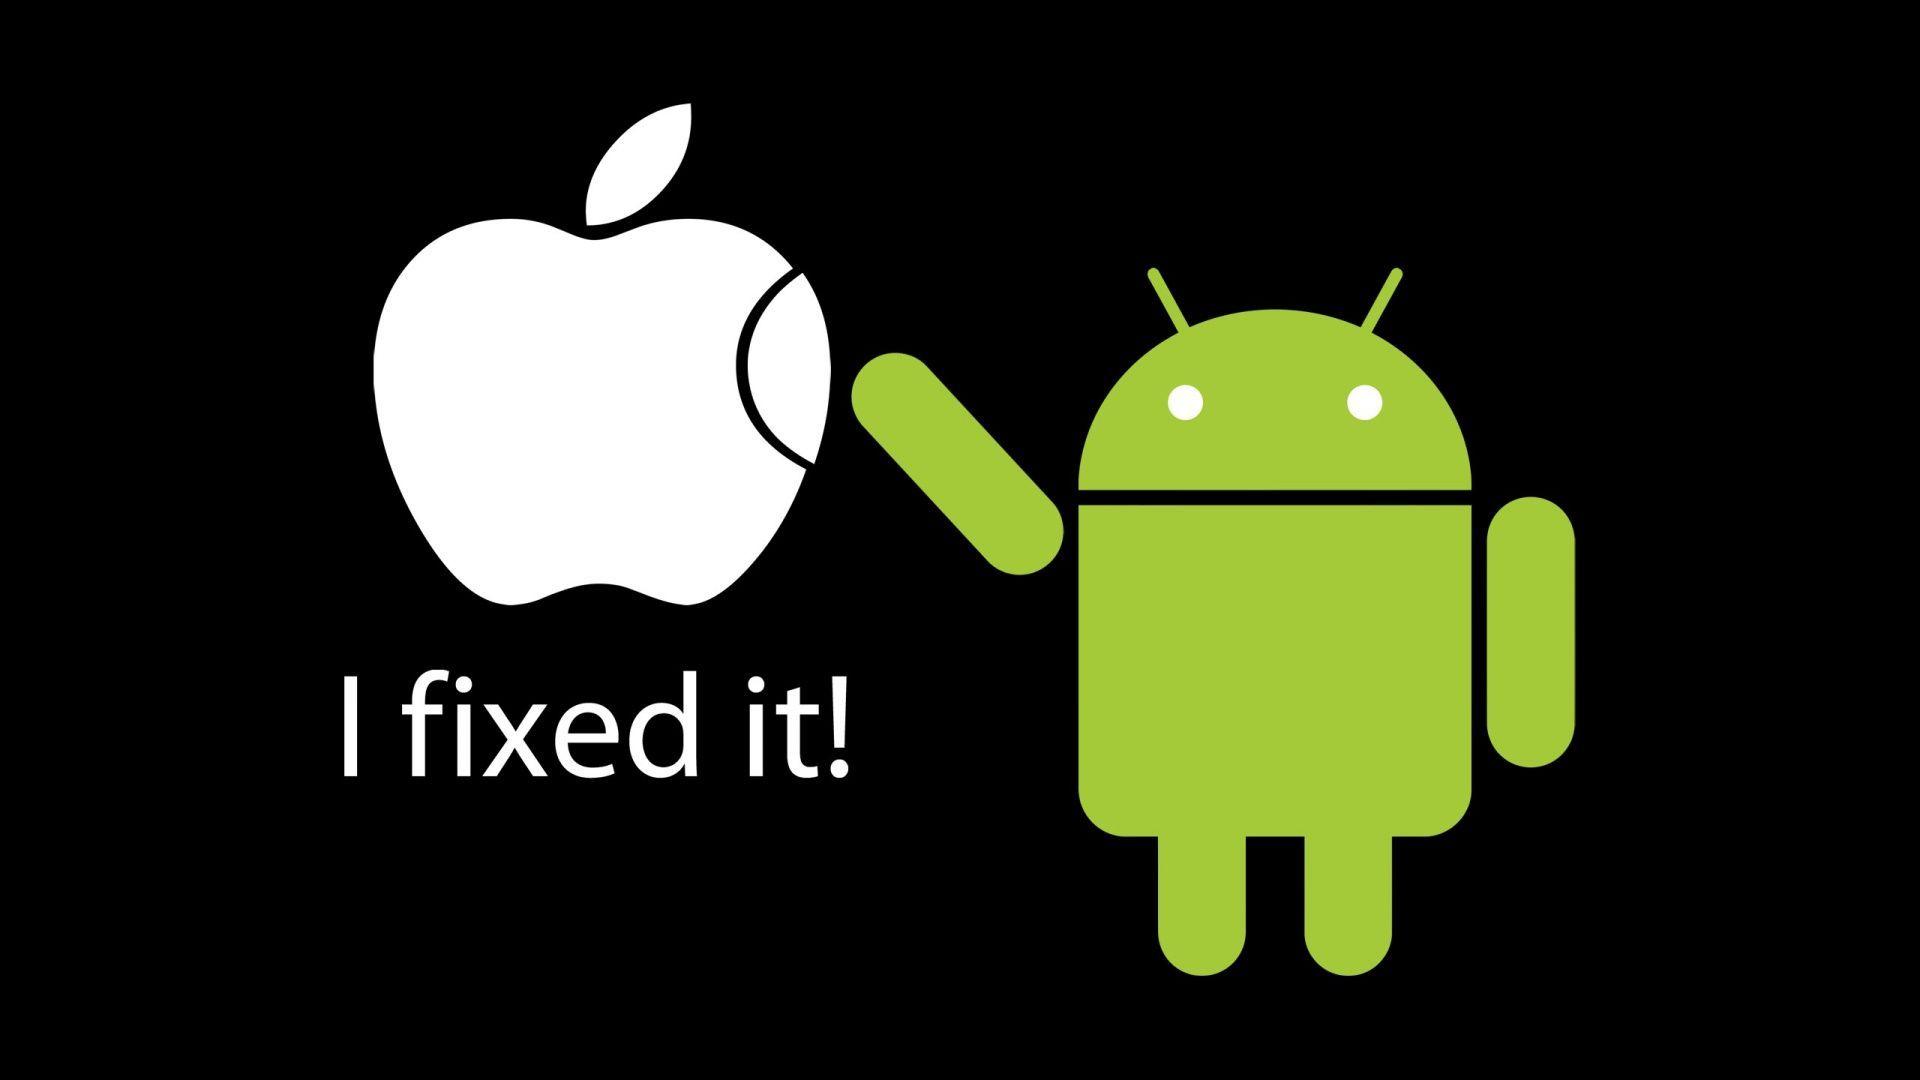 Free free wallpaper android vs apple hd apk download for android free free wallpaper android vs apple hd apk download for android voltagebd Gallery